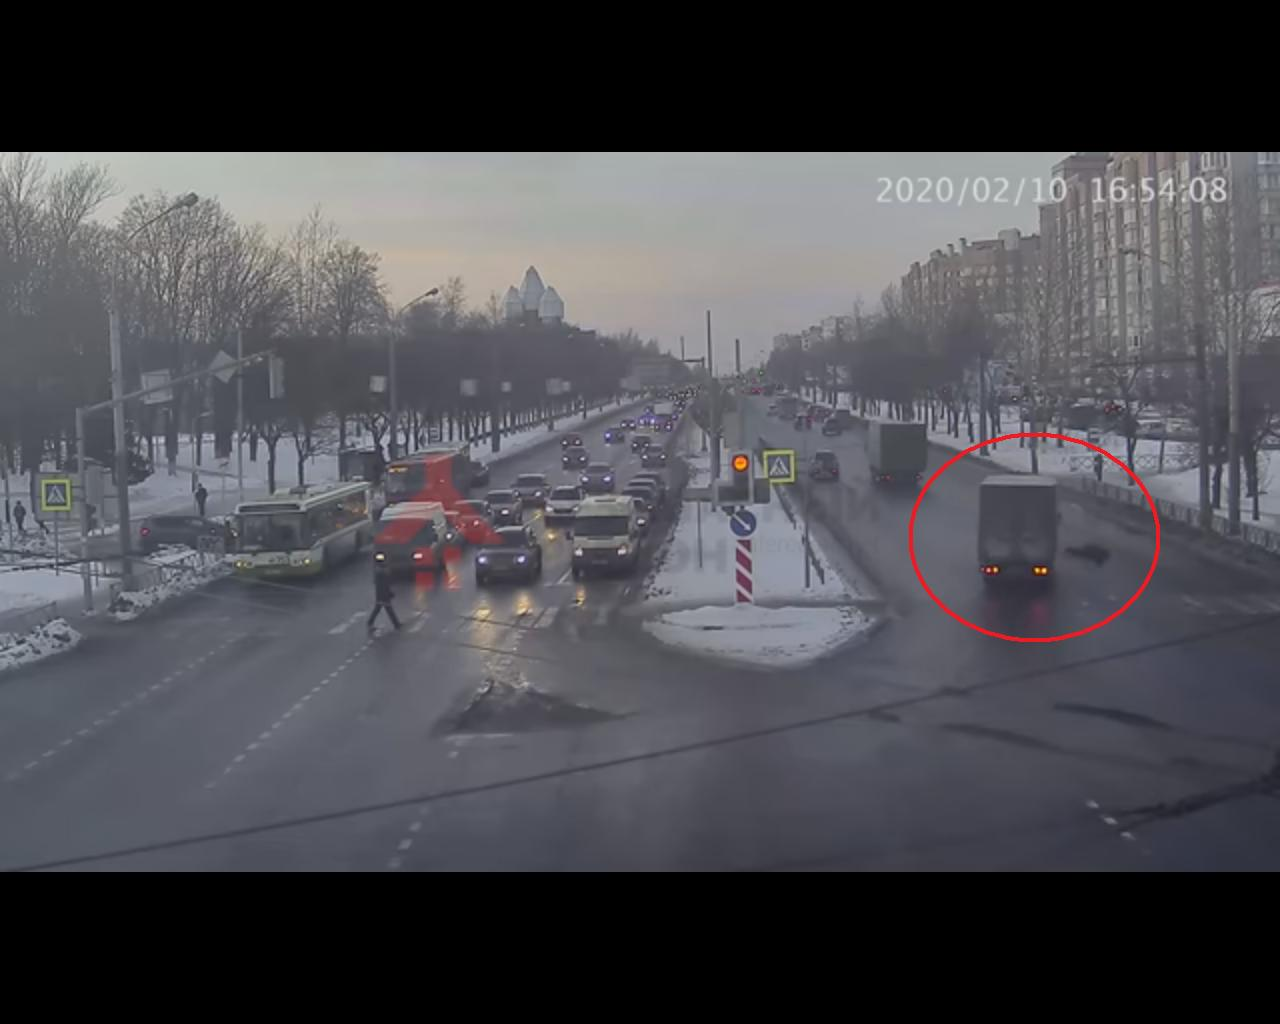 В Ярославле мужчину на переходе сбил грузовик: появилось видео аварии